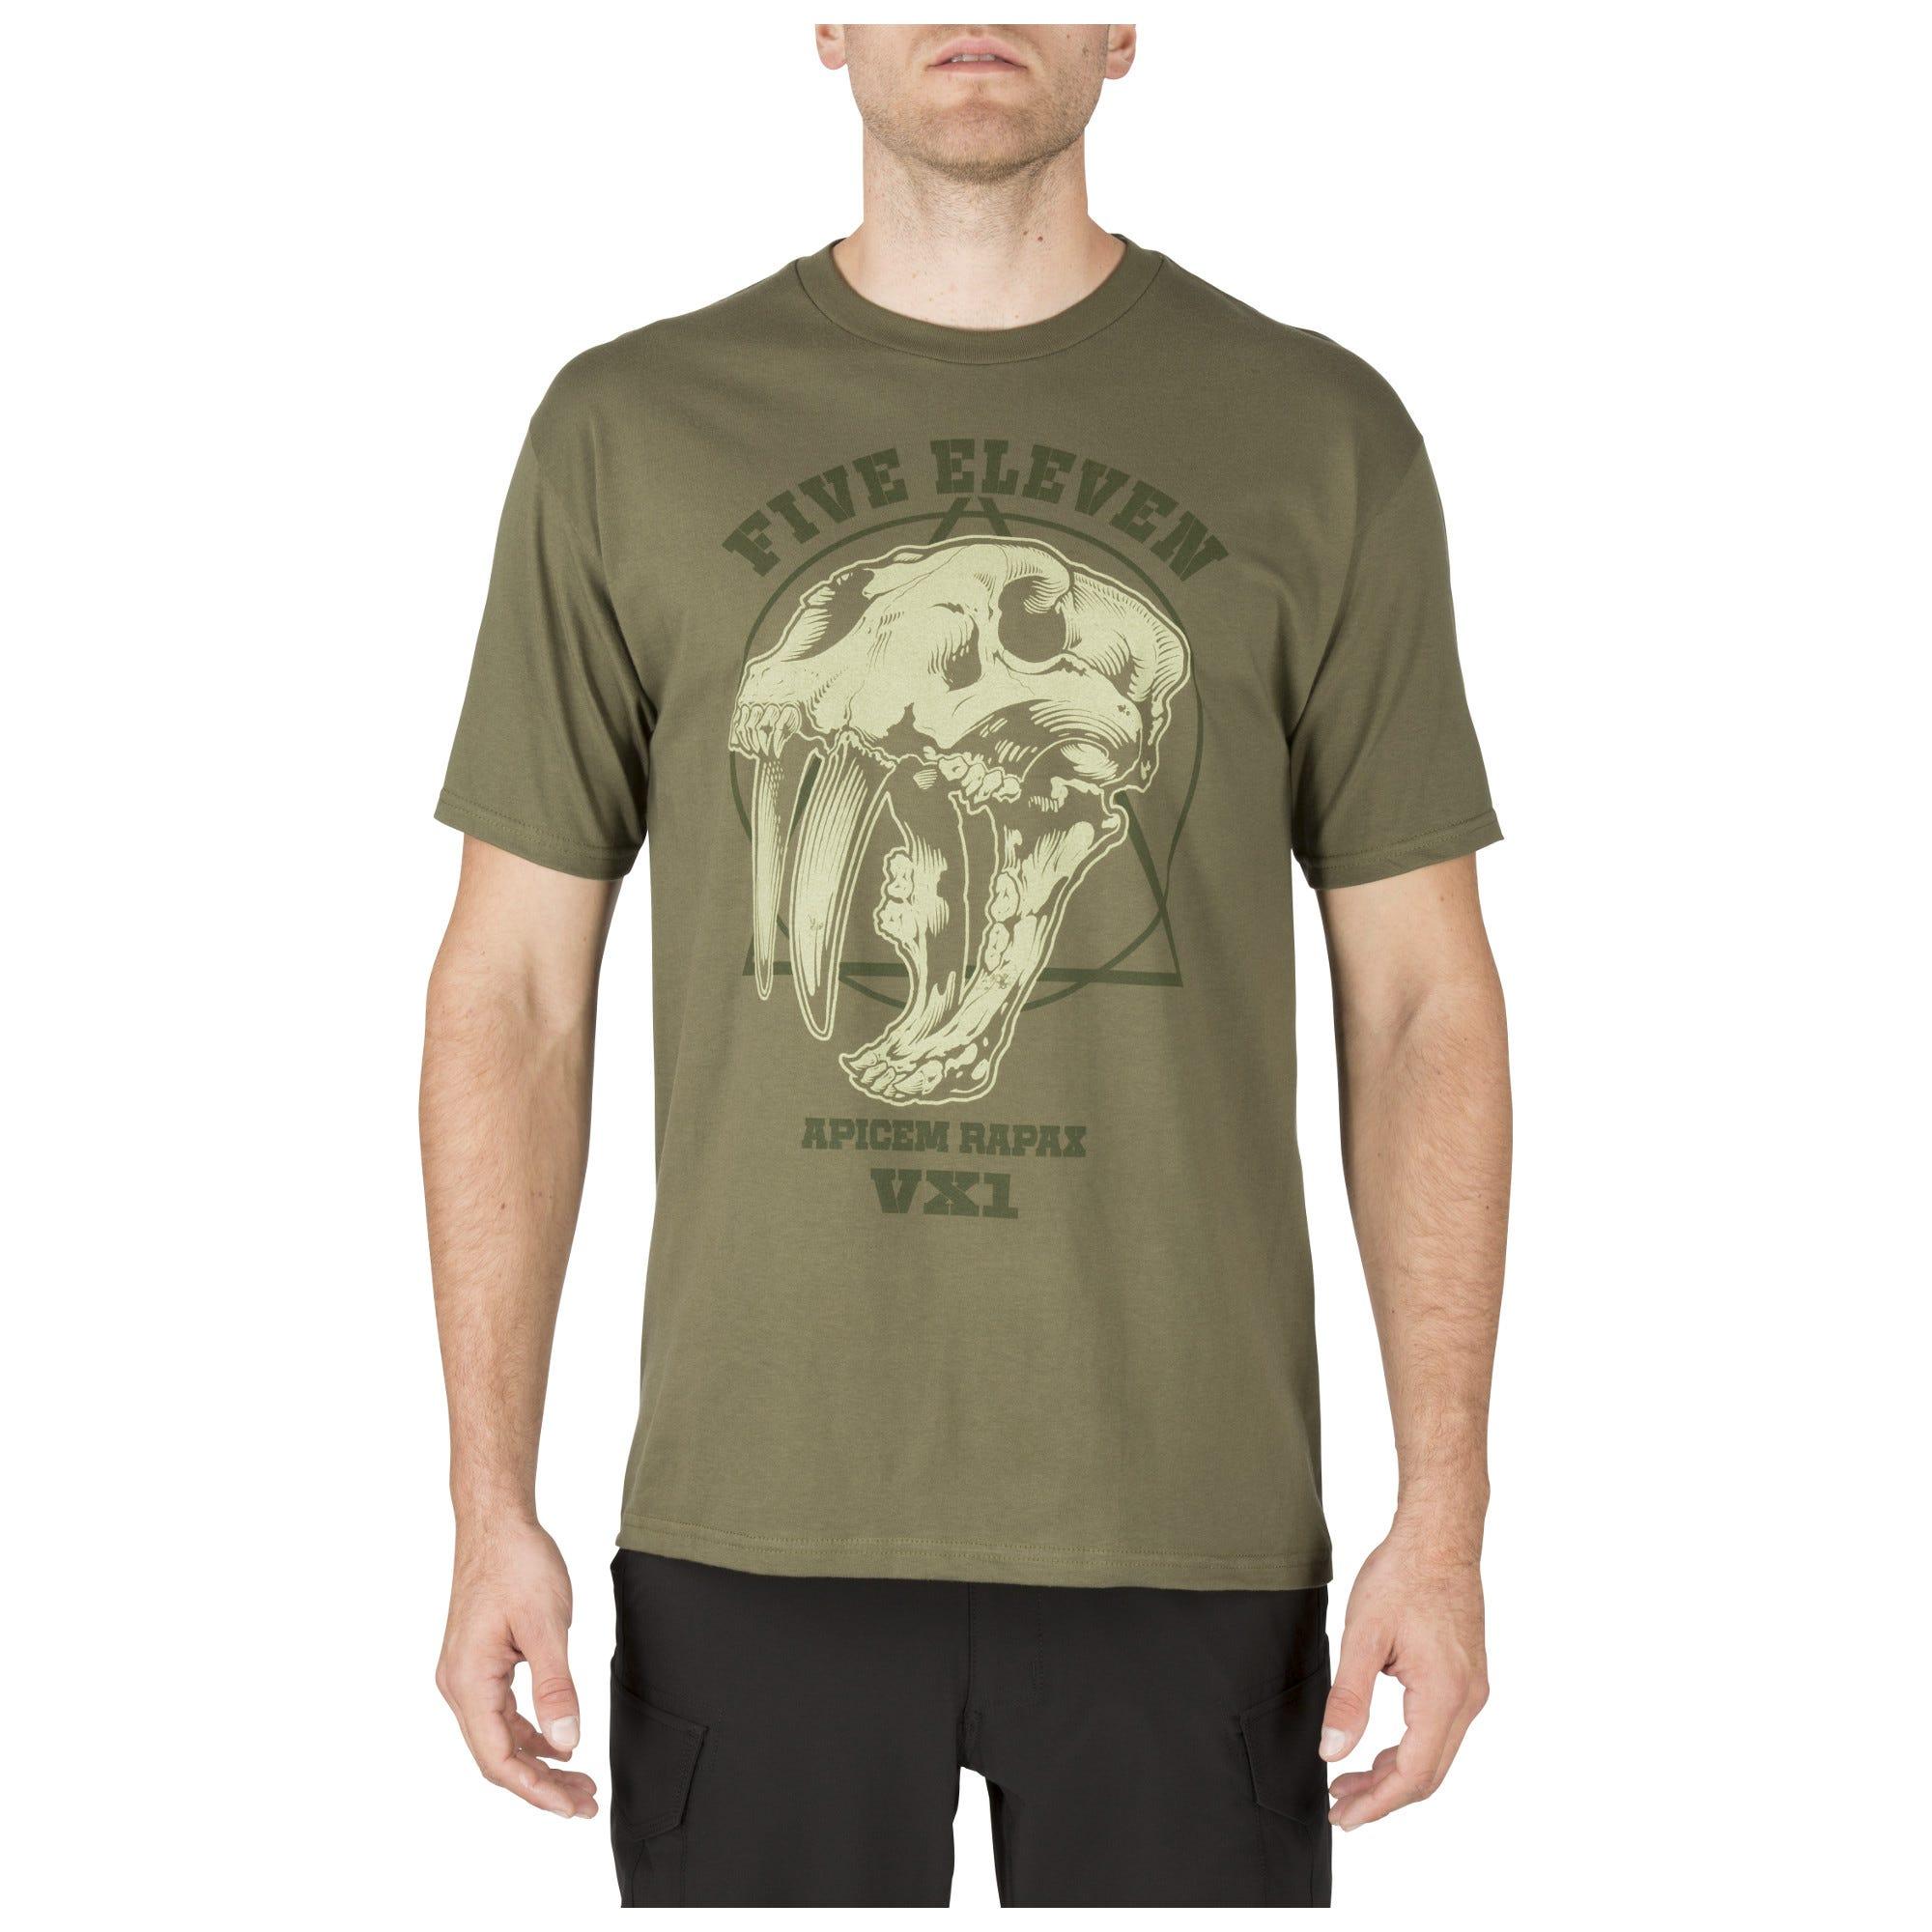 5.11 Tactical Men's Apex Predator Tee (Green)